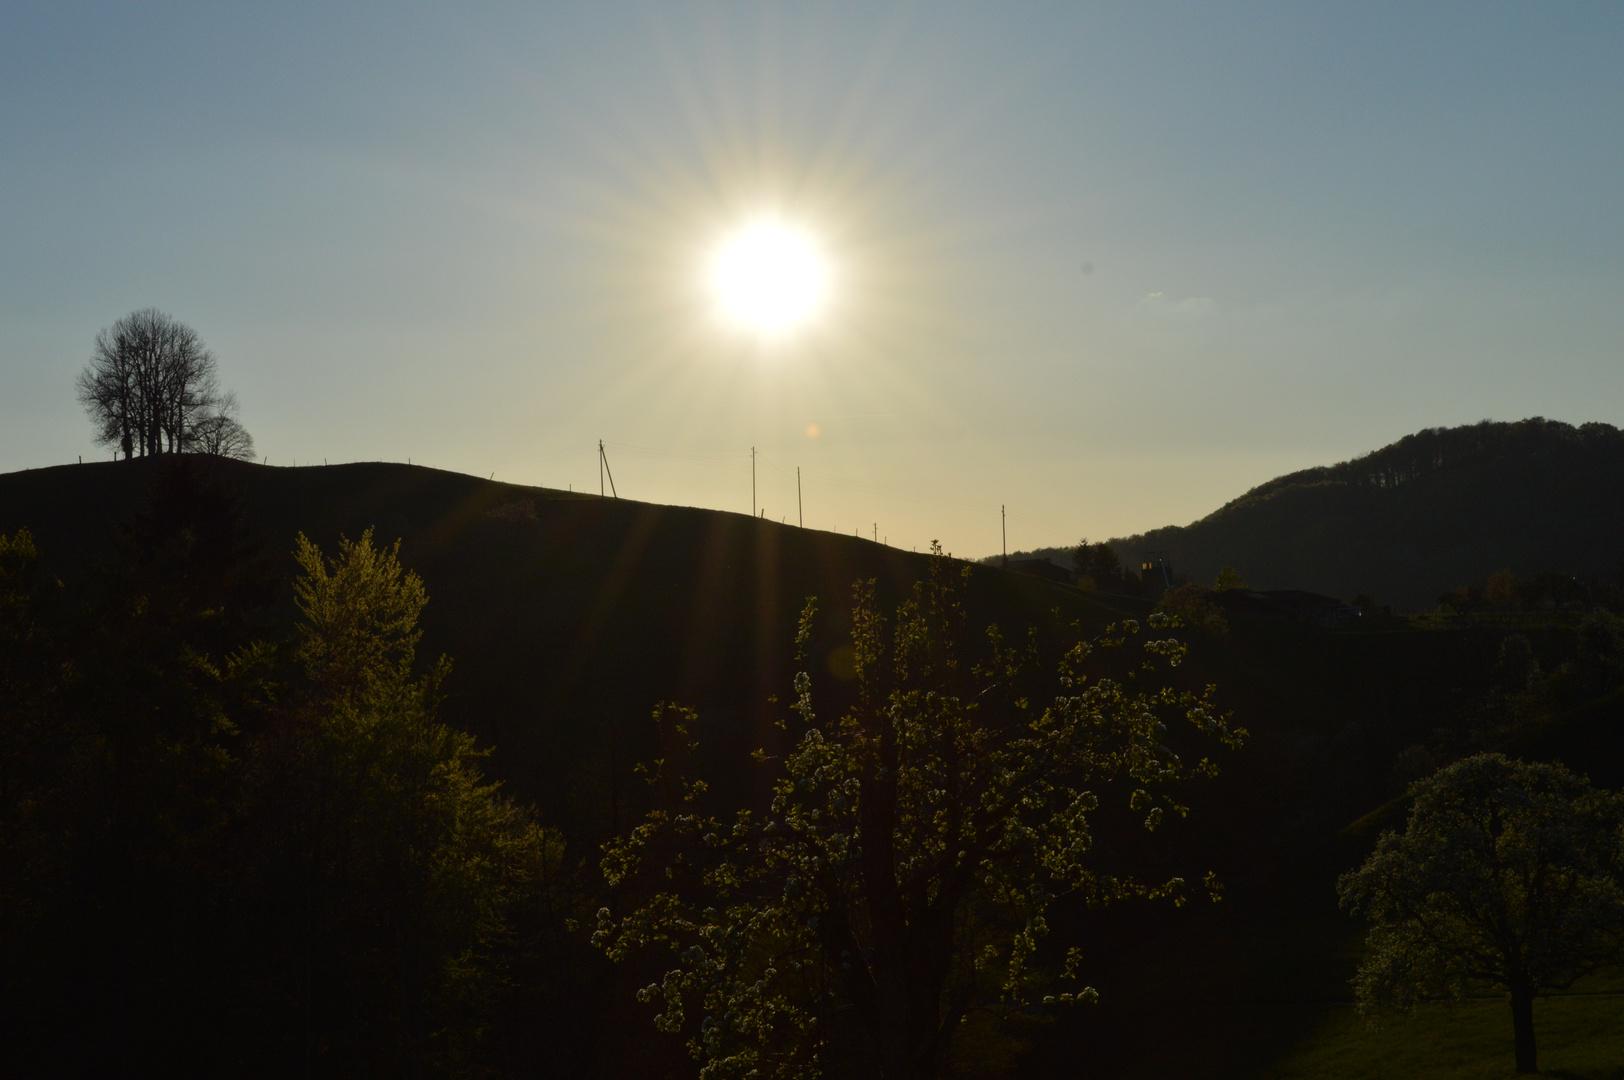 Sonnenuntergang über dem Horizont